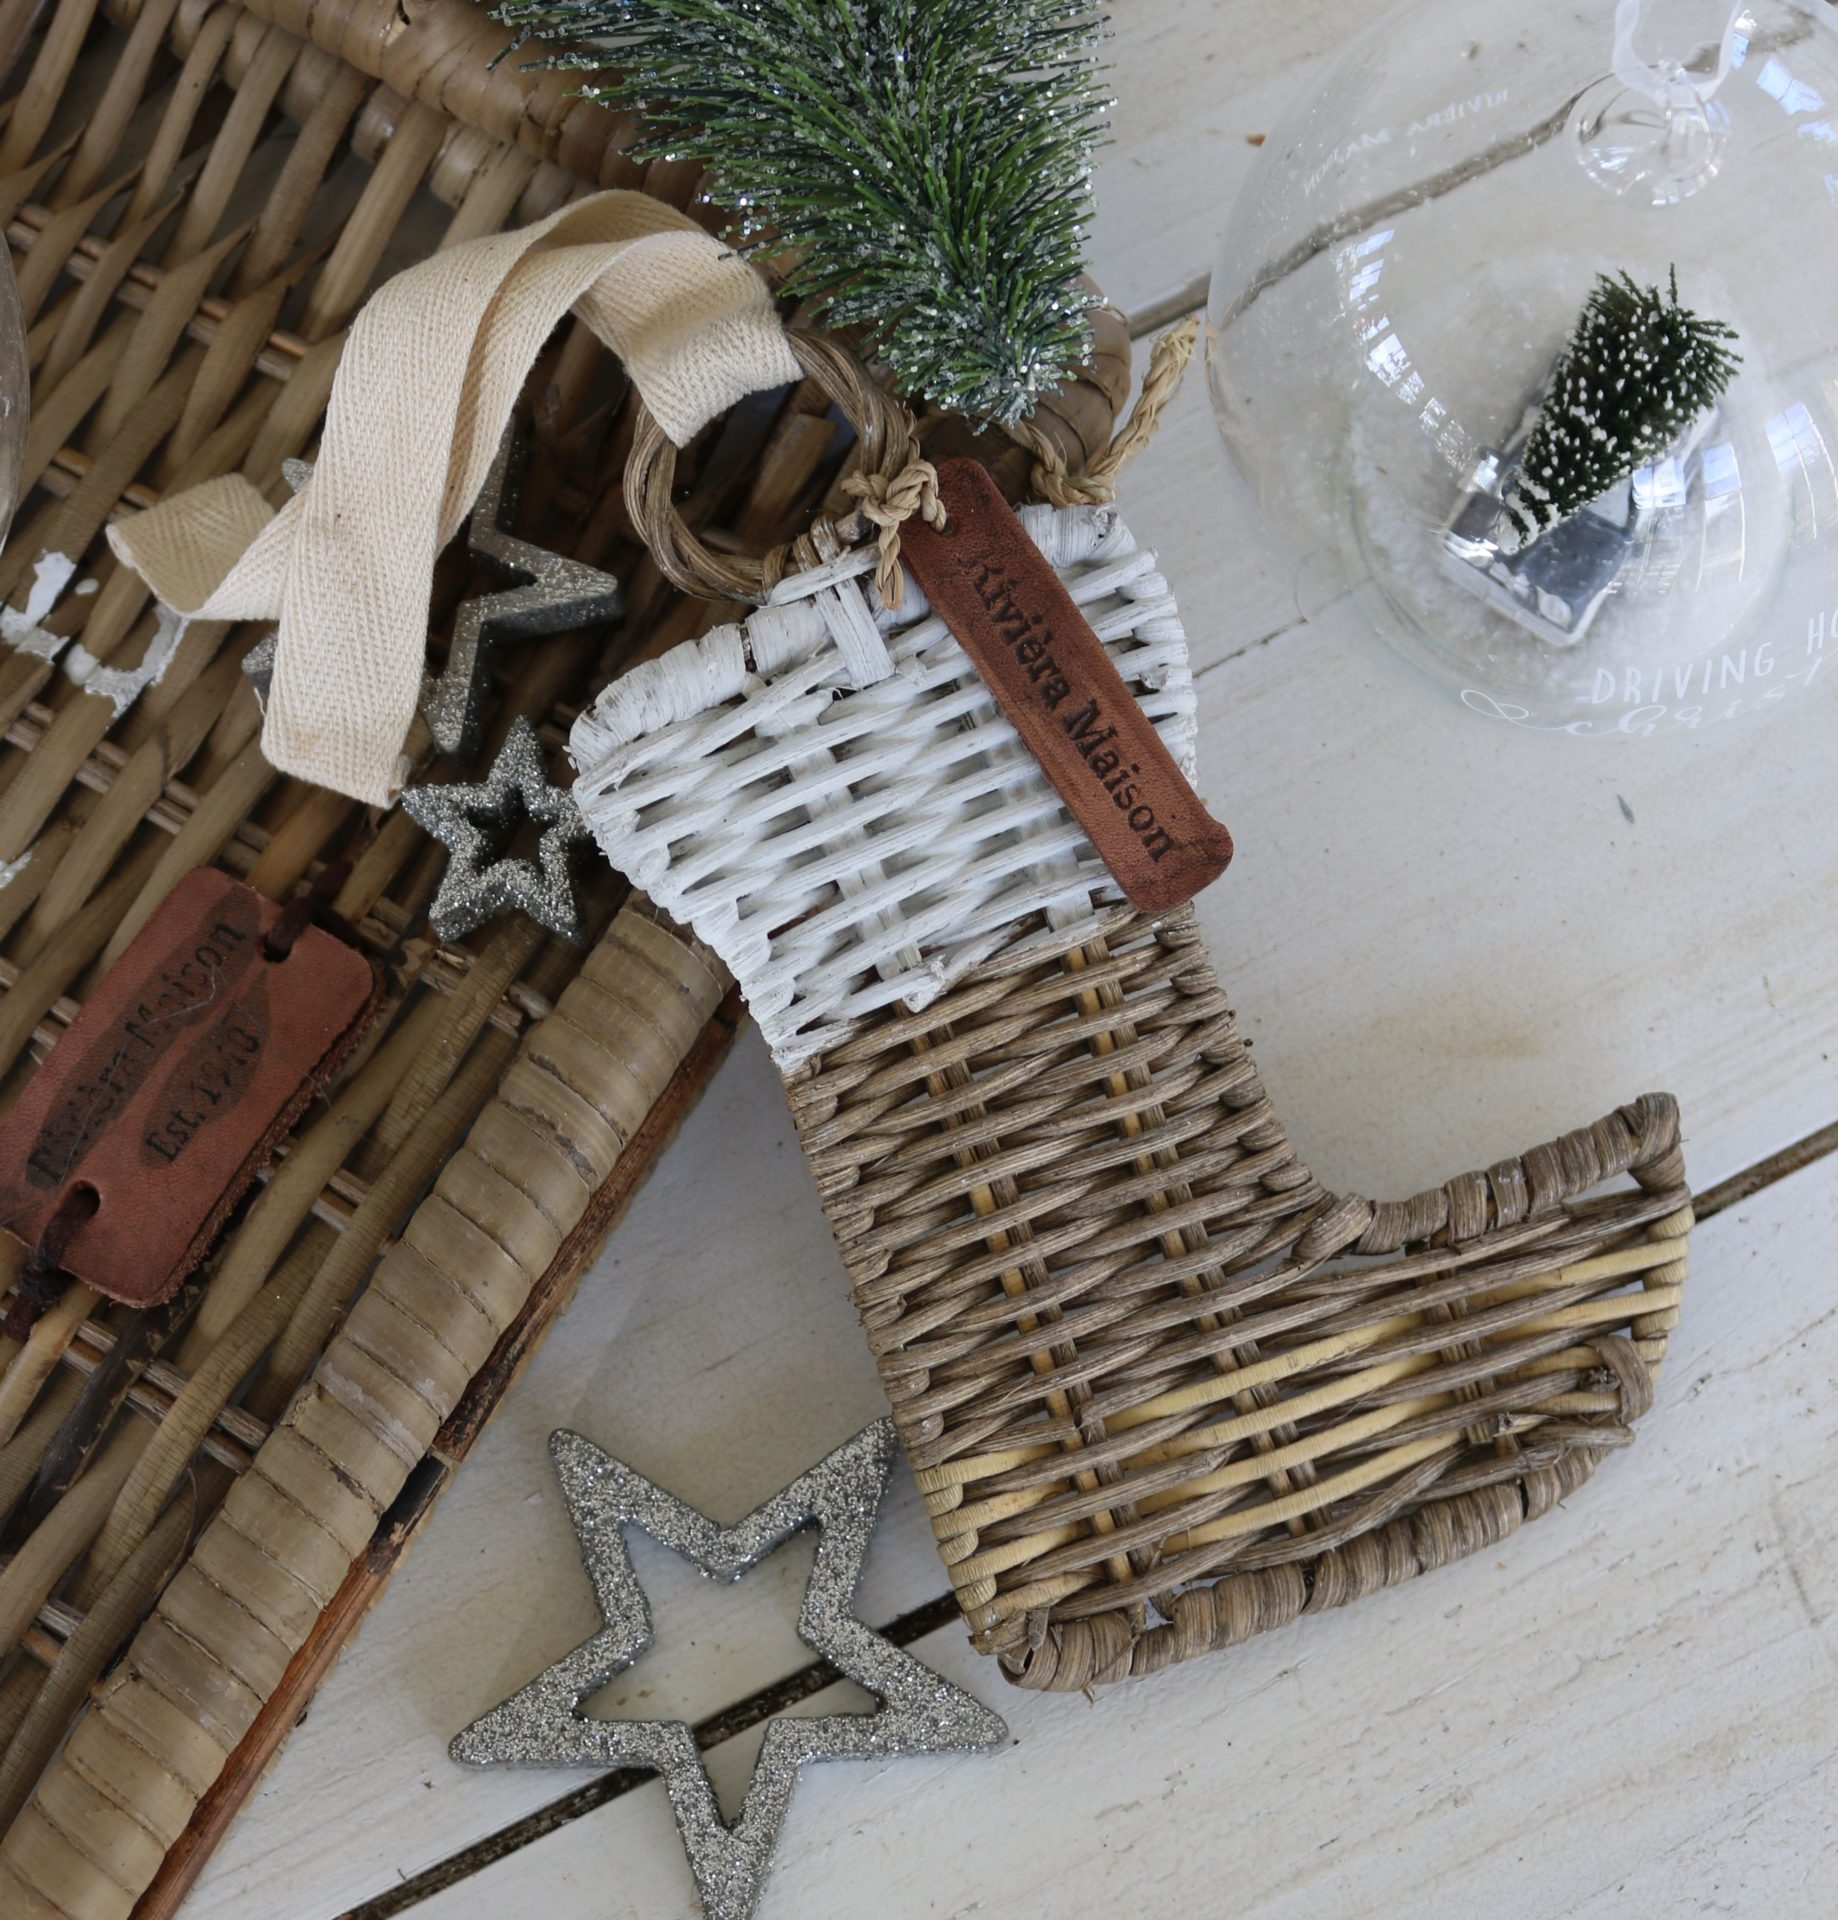 Julesok – Rustic Rattan Christmas Hanger Stocking